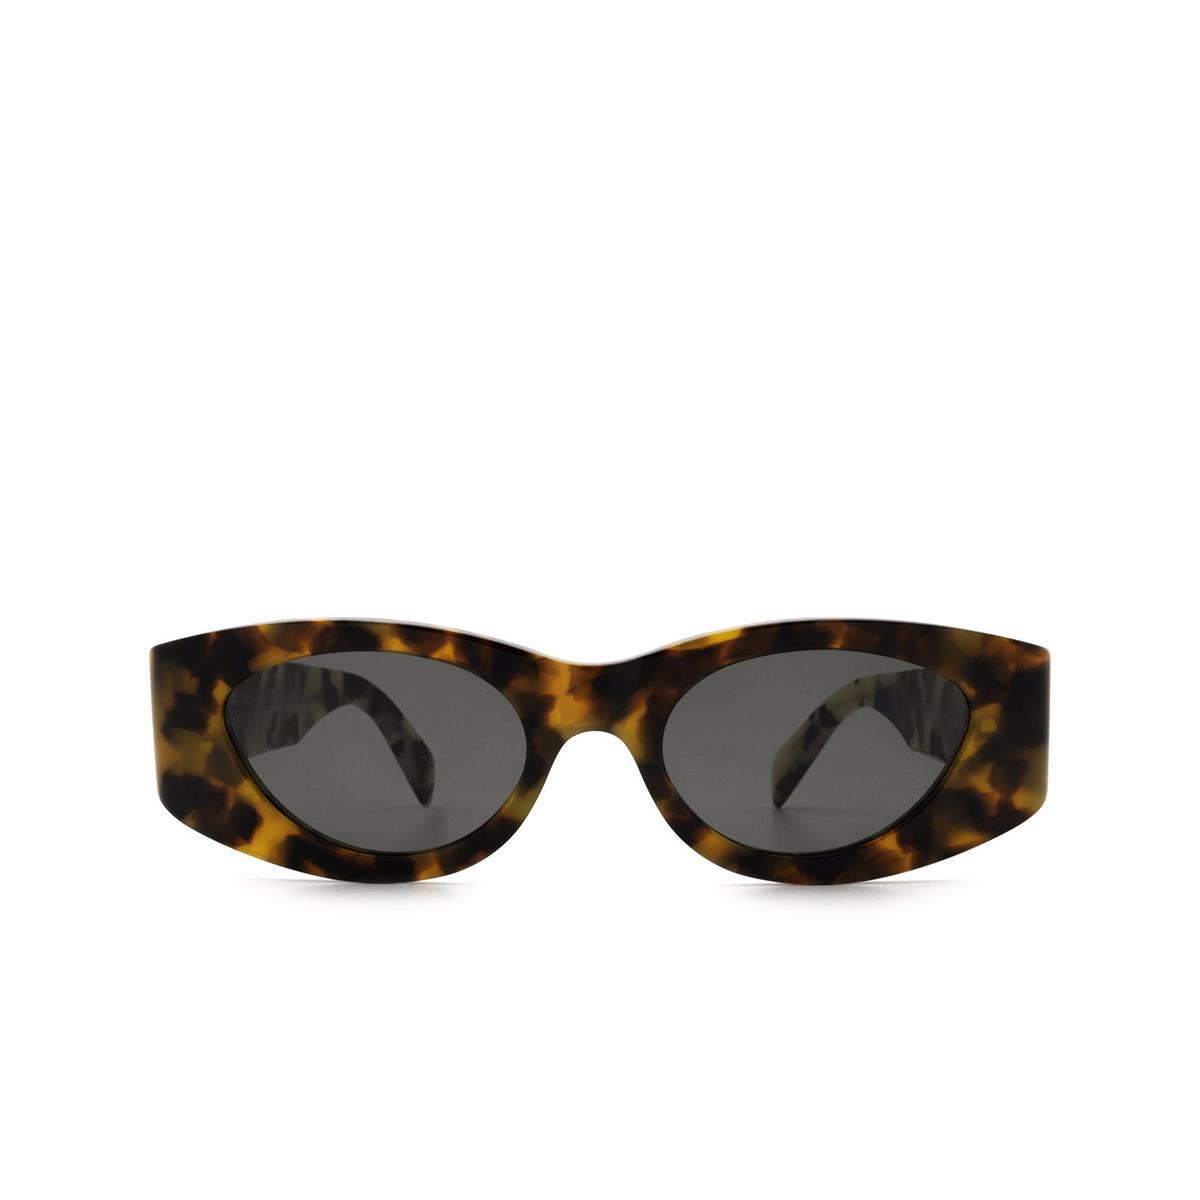 Retrosuperfuture® Oval Sunglasses: Atena color Orgia Havana LL0 - front view.